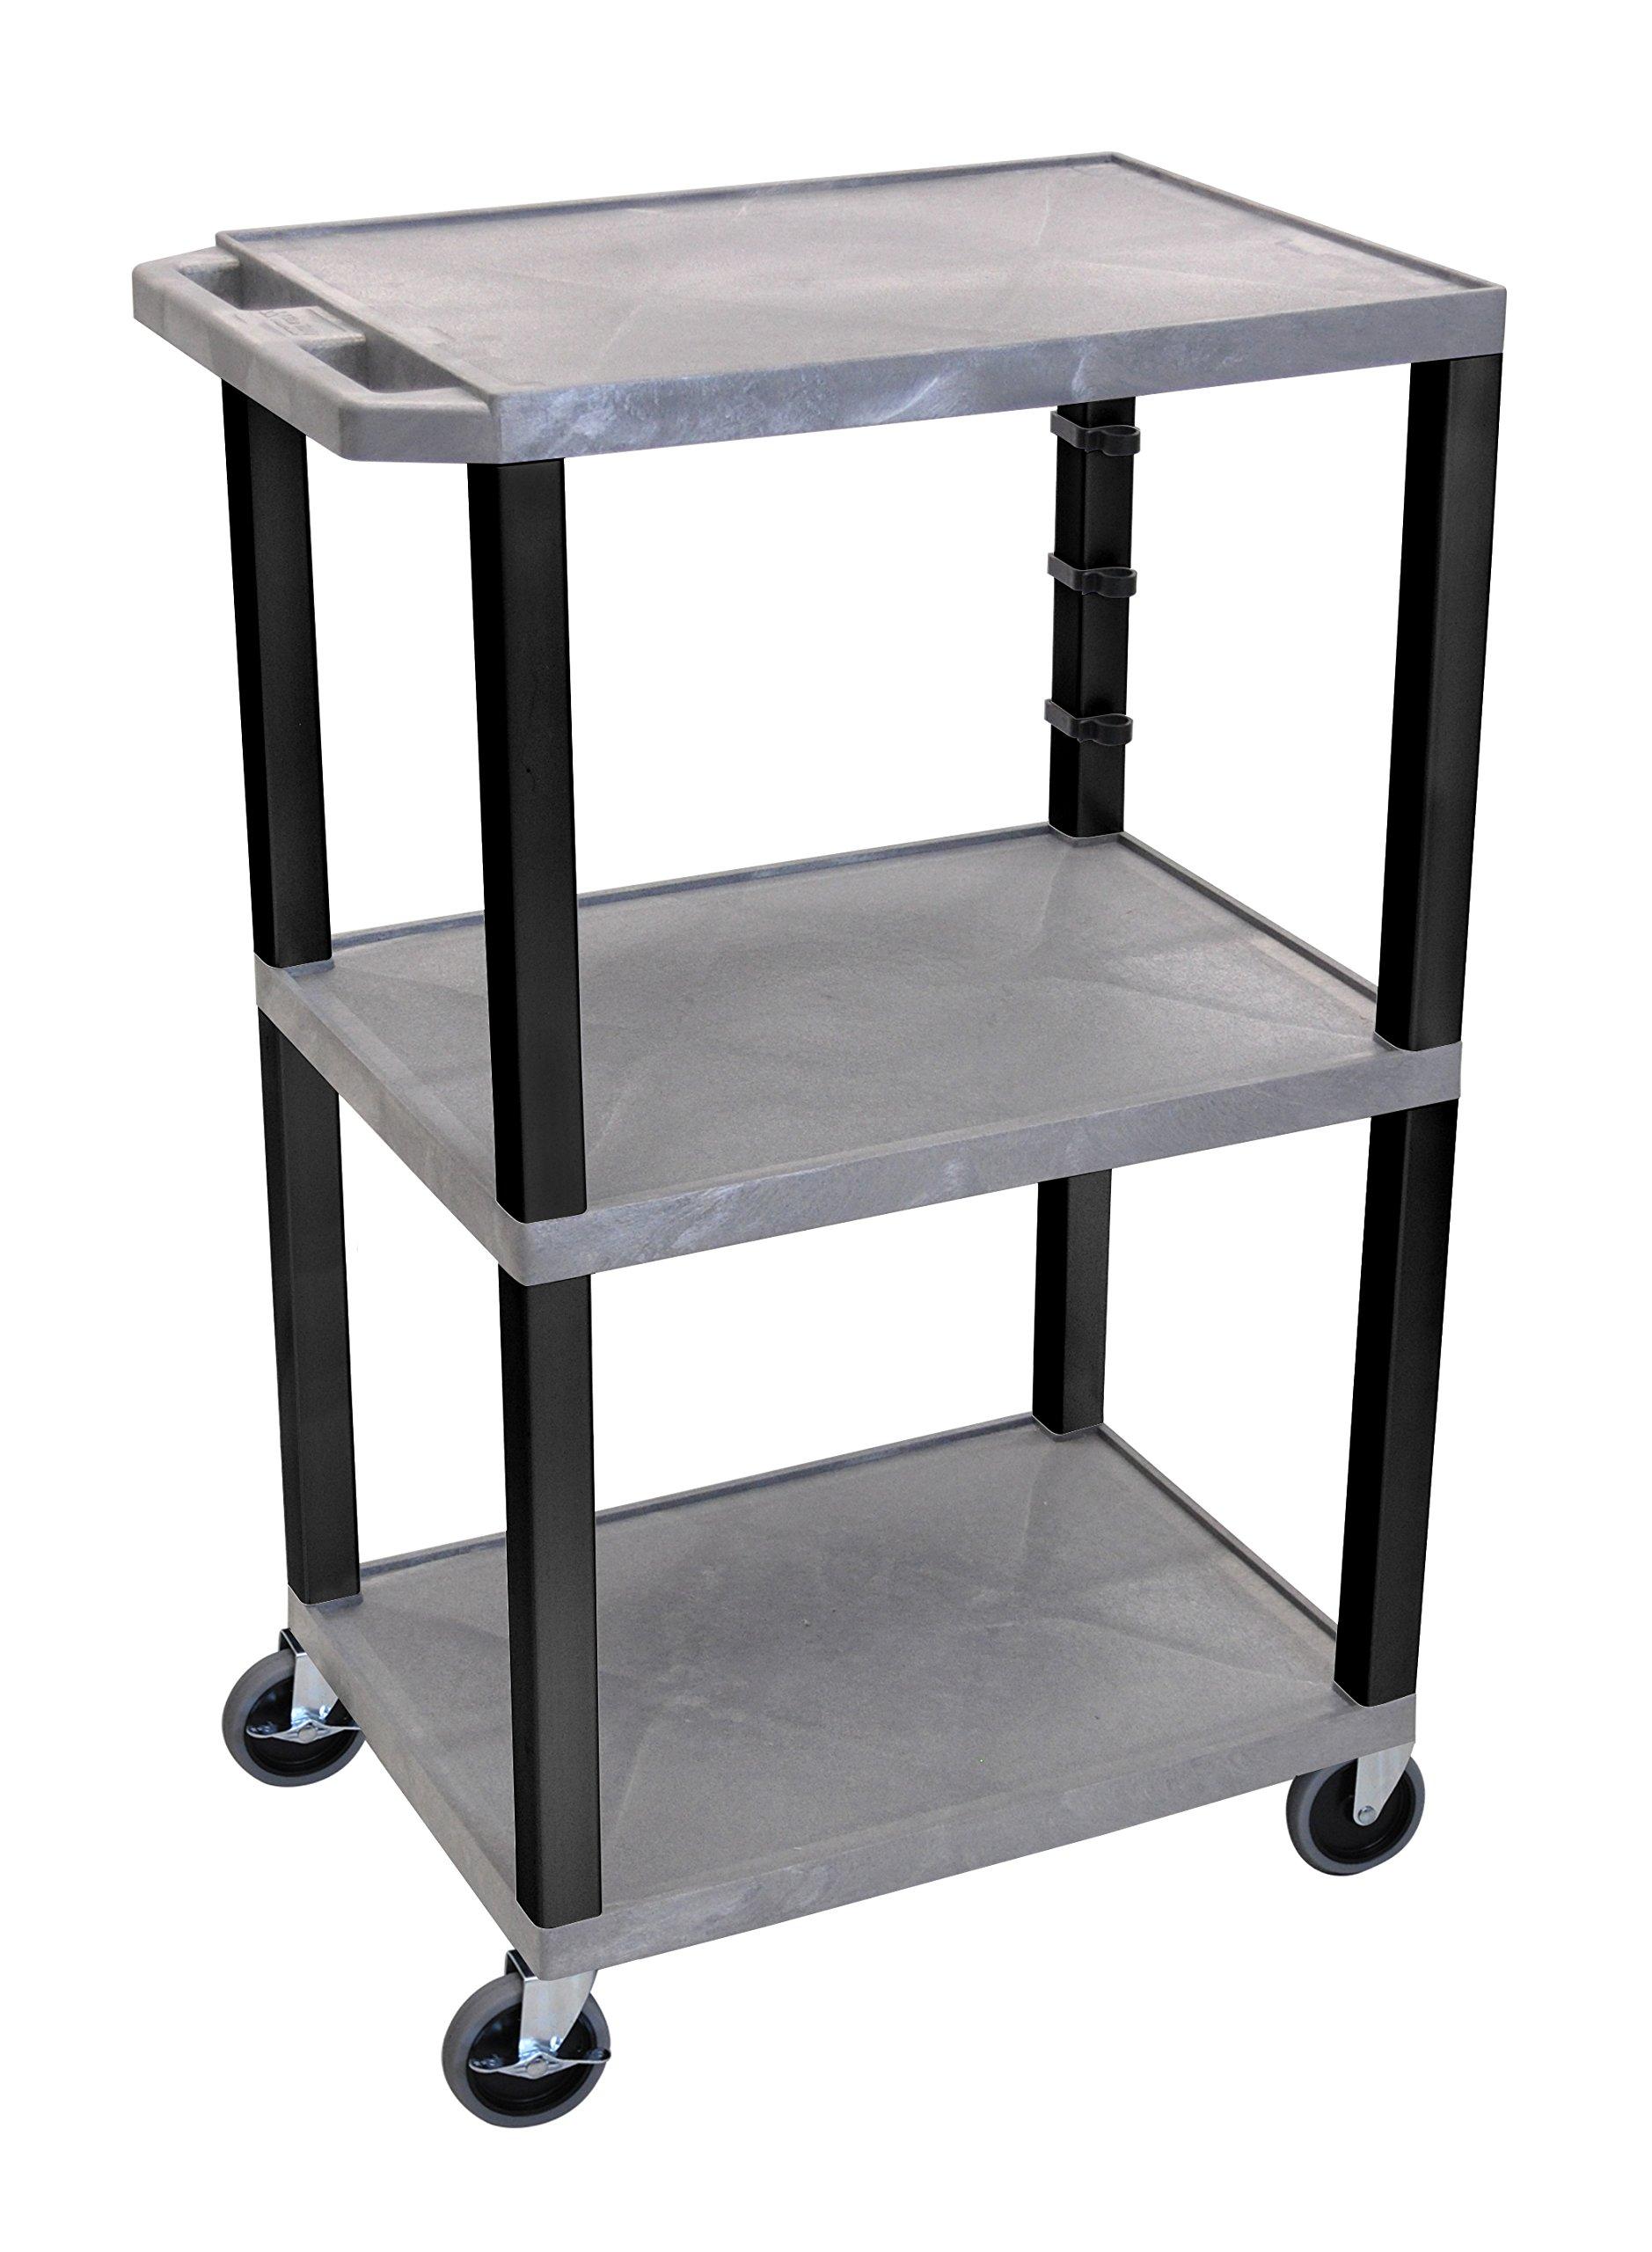 Luxor WT42GYE-B 42'' Multipurpose 3 Shelf A/V Cart with Electric - Black Leg